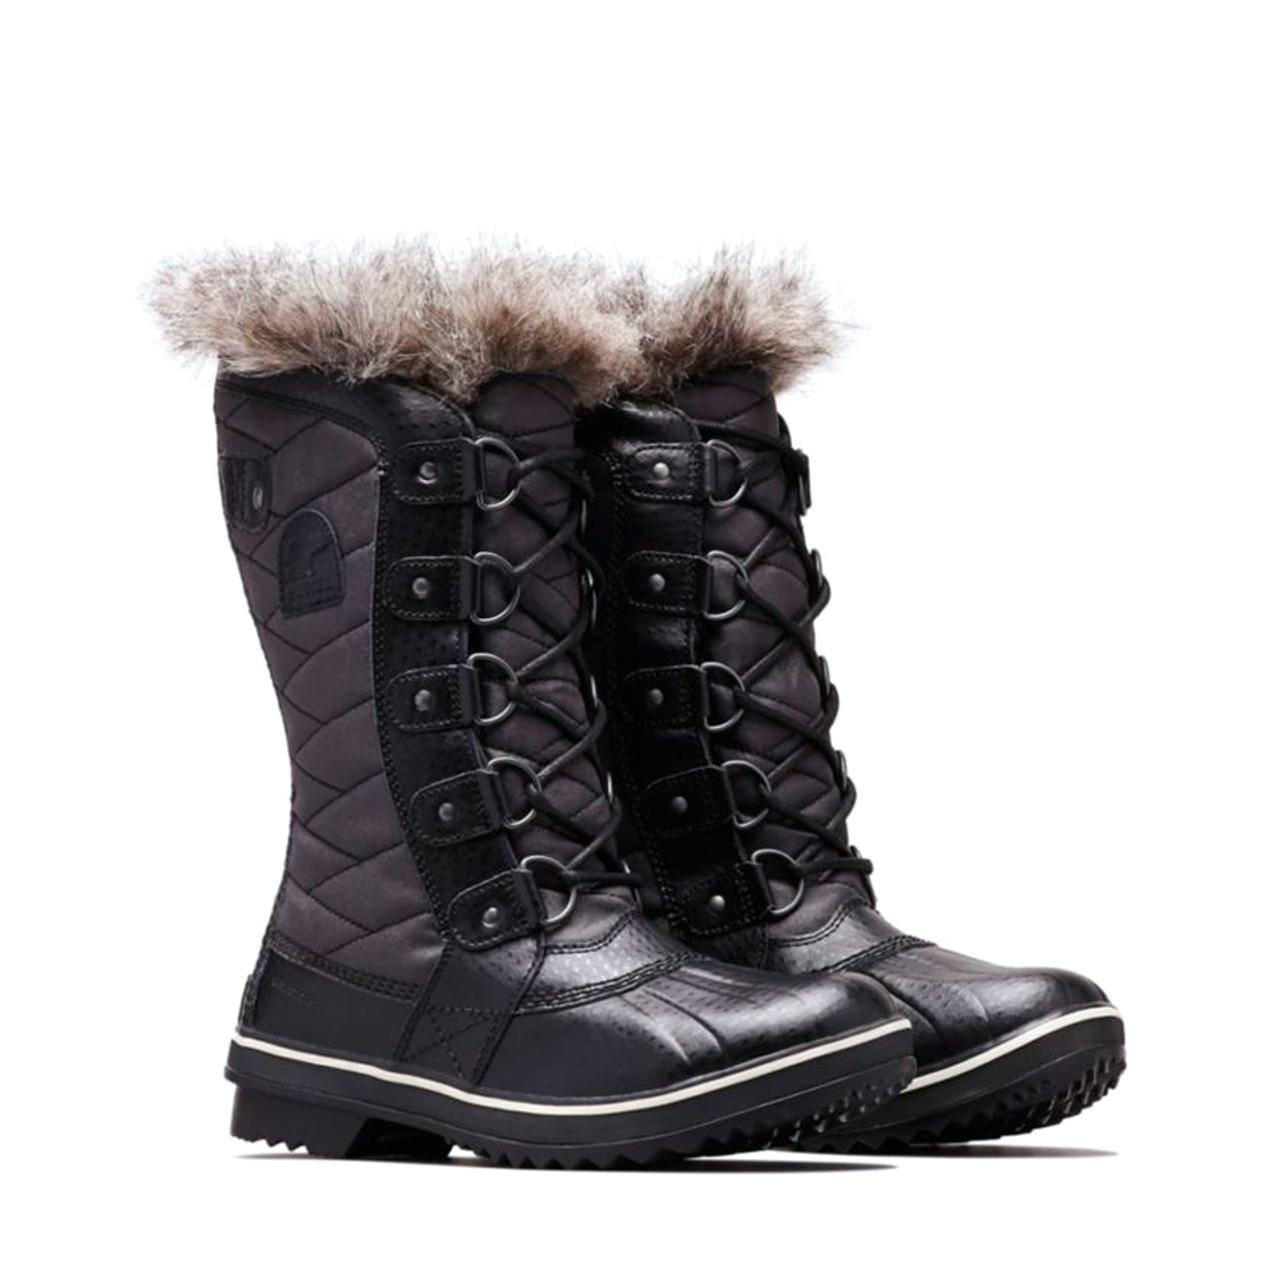 41dbcaf5d5bf Sorel Women s Tofino II Winter Boot Black Stone - Shop now   Shoolu.com